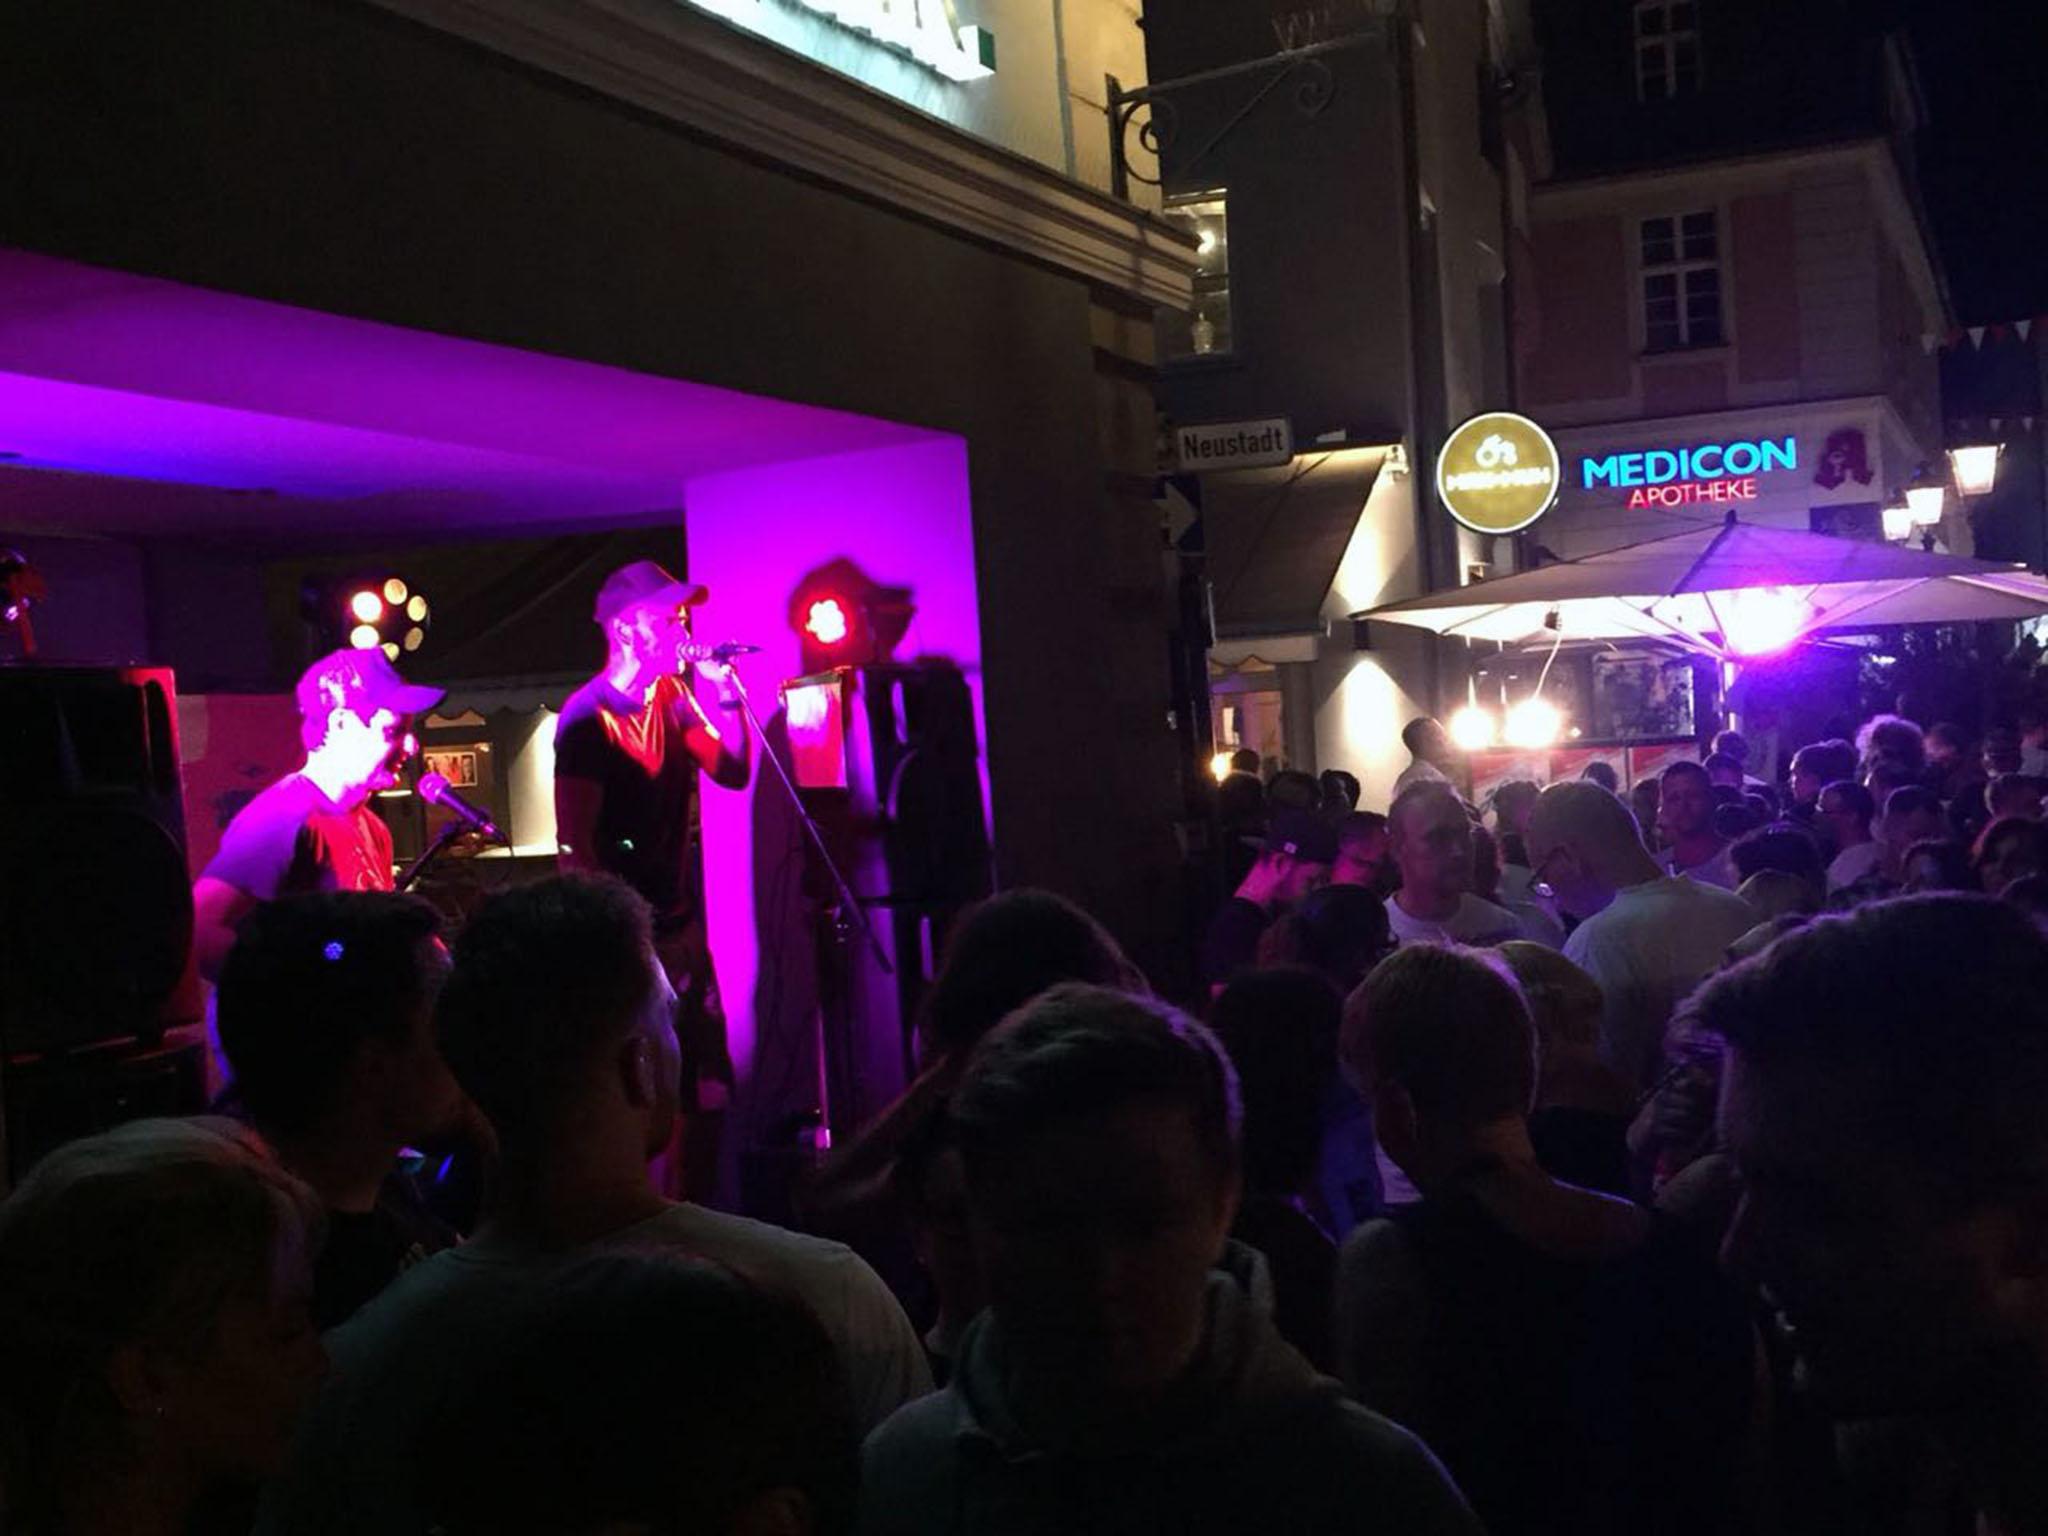 Musikalische Darbietungen auf dem Altstadtfest. Foto: Alexandra Lyttwin